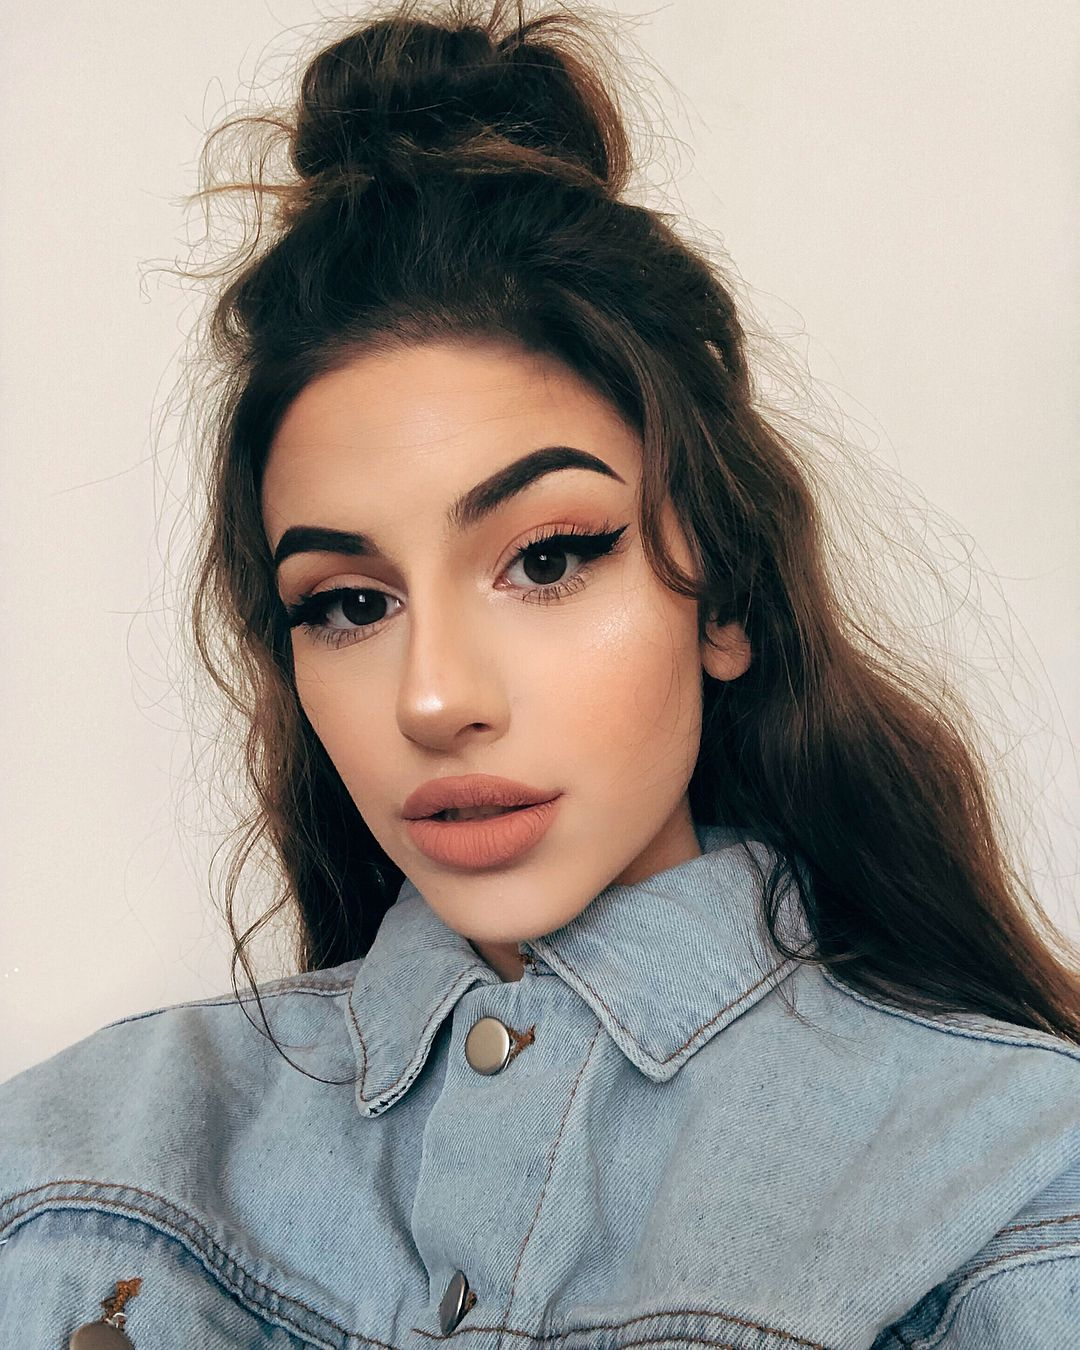 Pin by claudia on makeup in pinterest makeup hair makeup